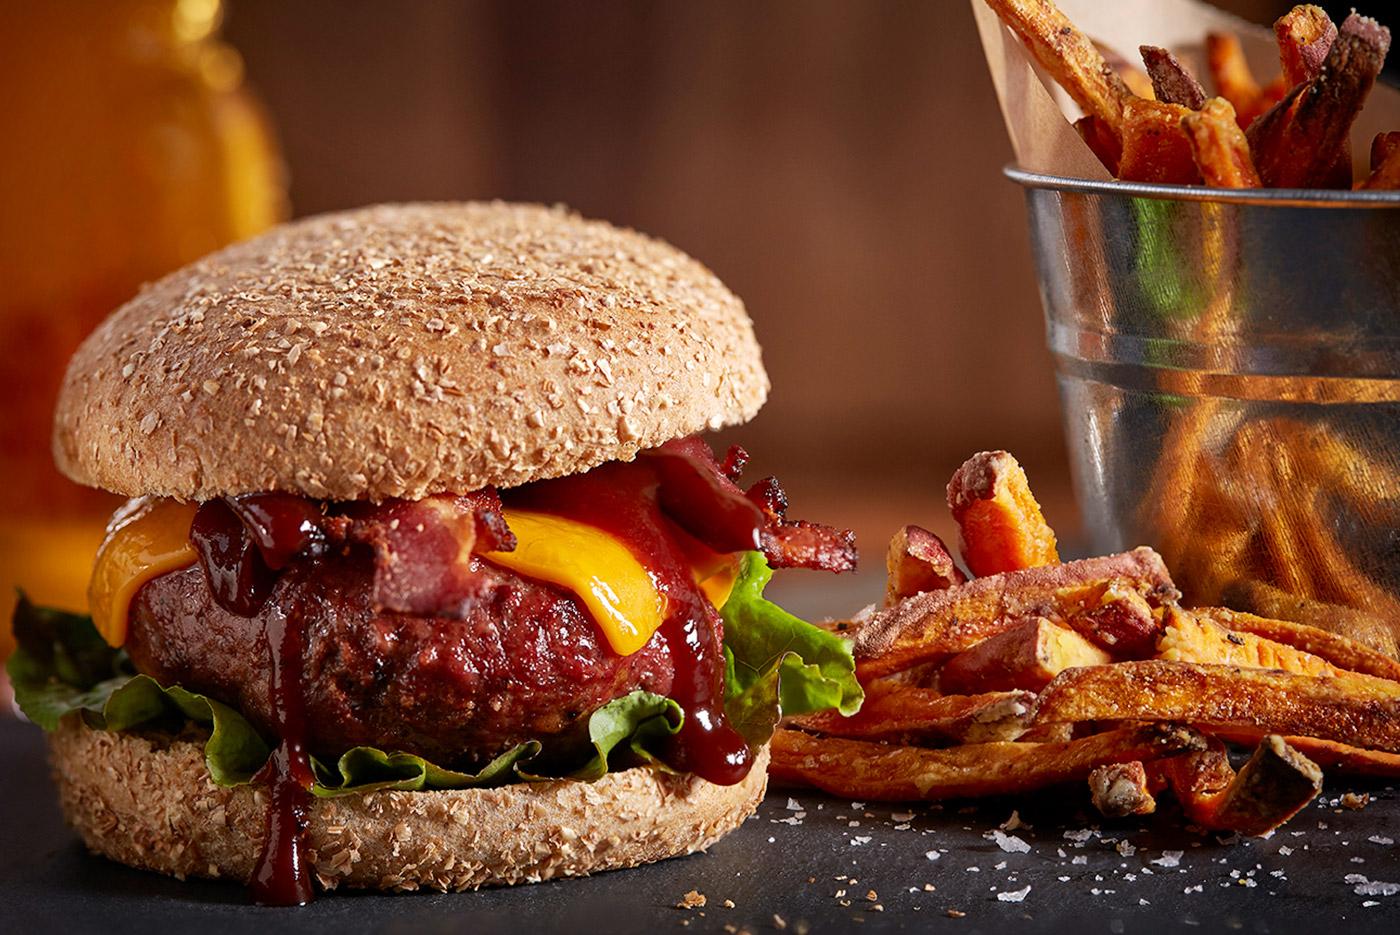 burger-joejenkinproductions.jpg